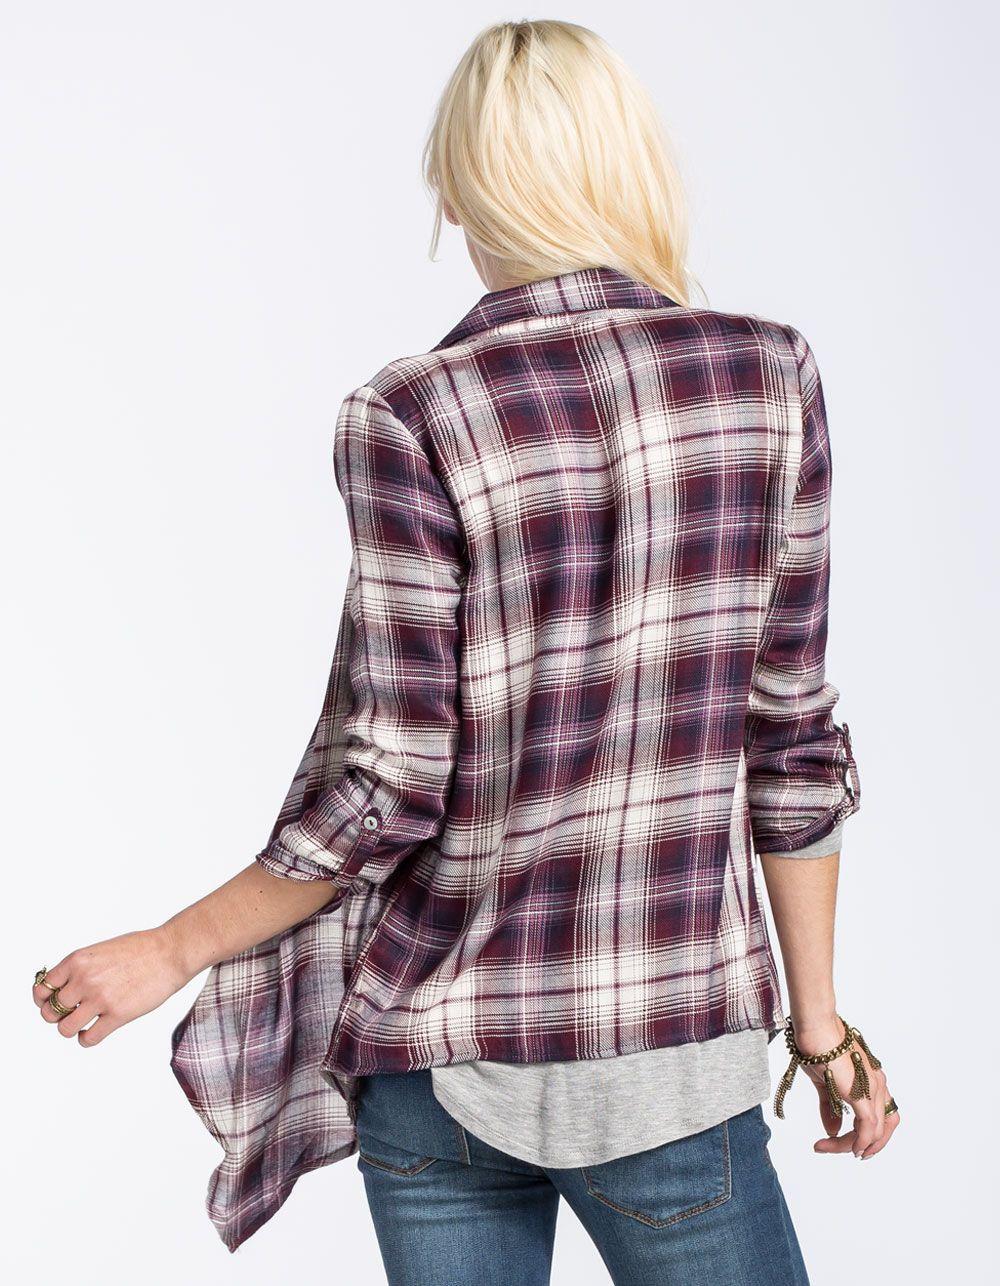 FULL TILT Plaid Womens Wrap Shirt 255851750 | Blouses & Shirts